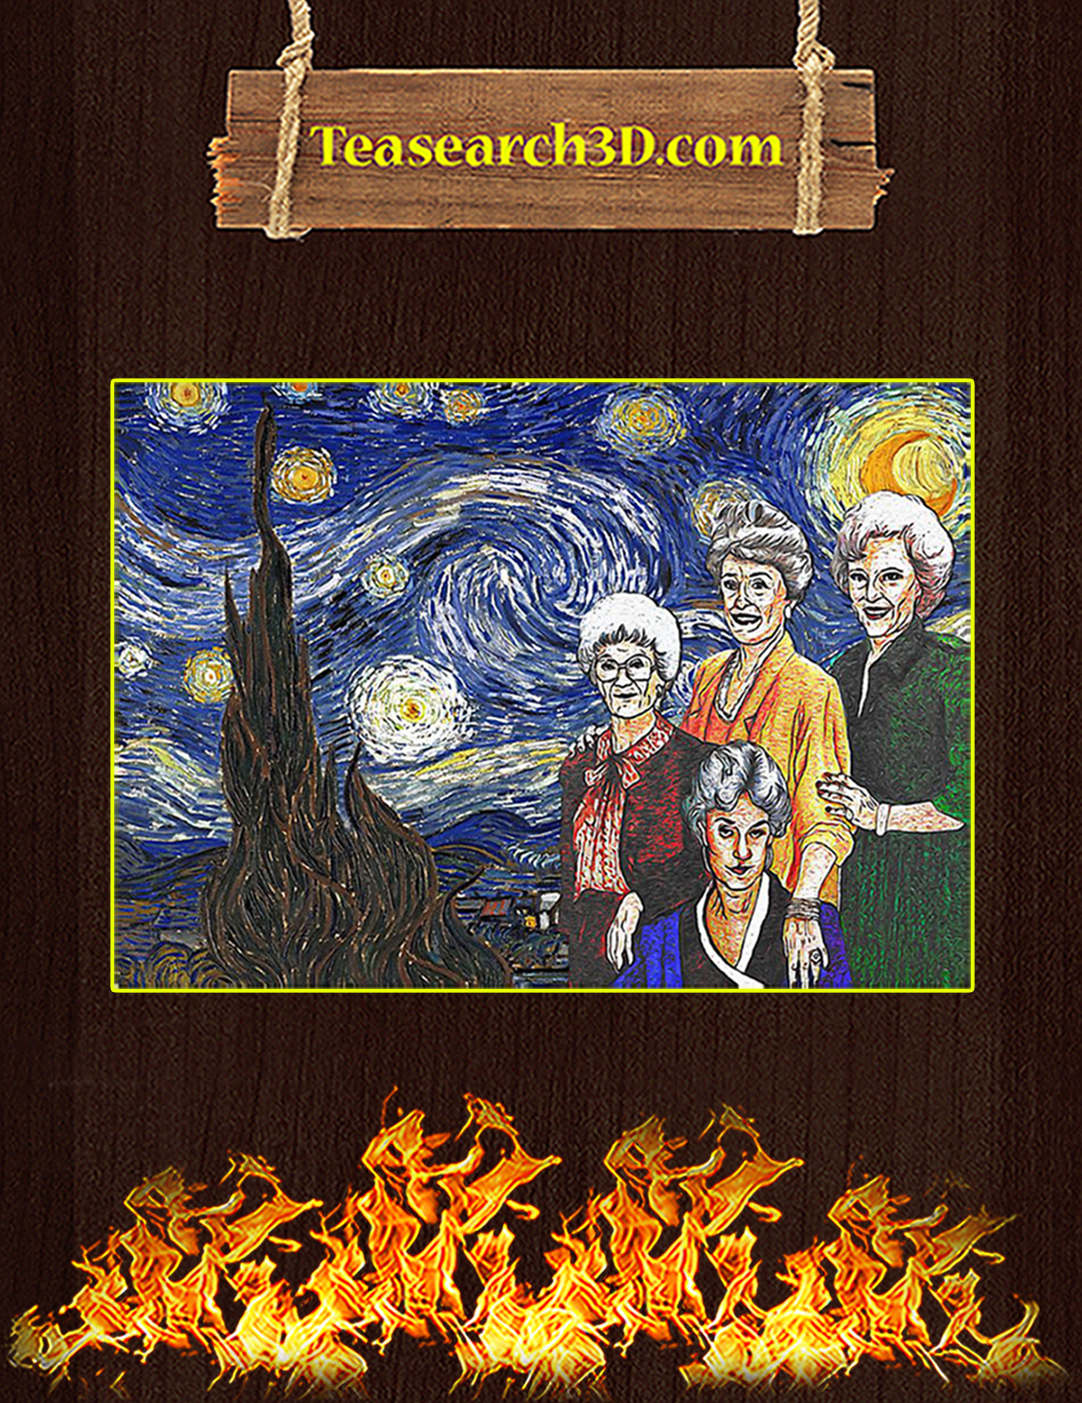 The golden girls starry night poster A2